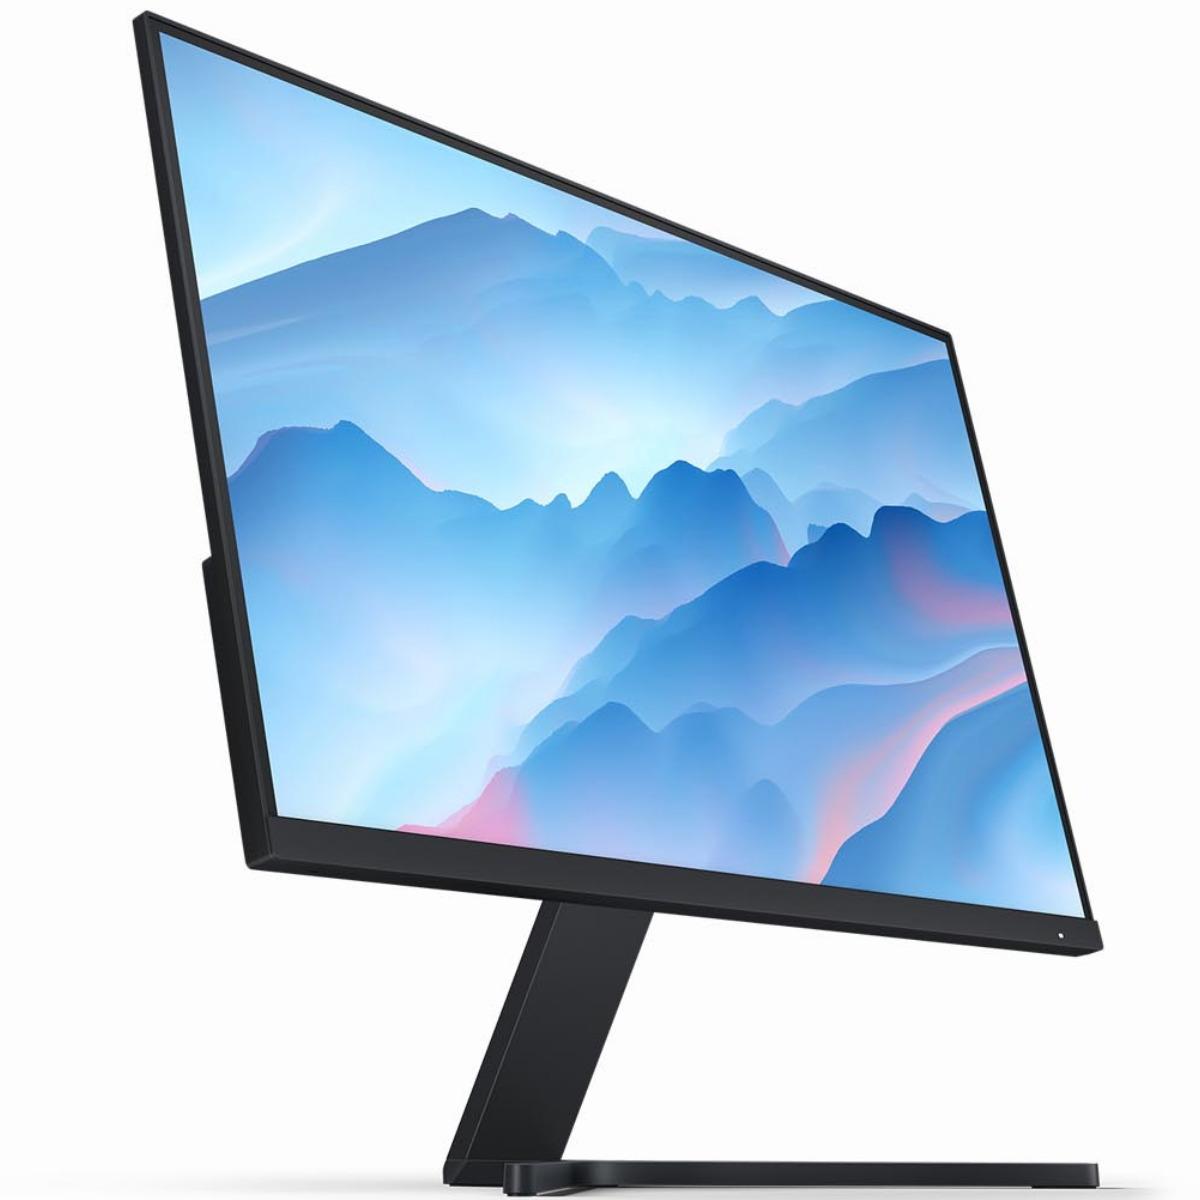 Xiaomi Mi Desktop Monitor 27 inch